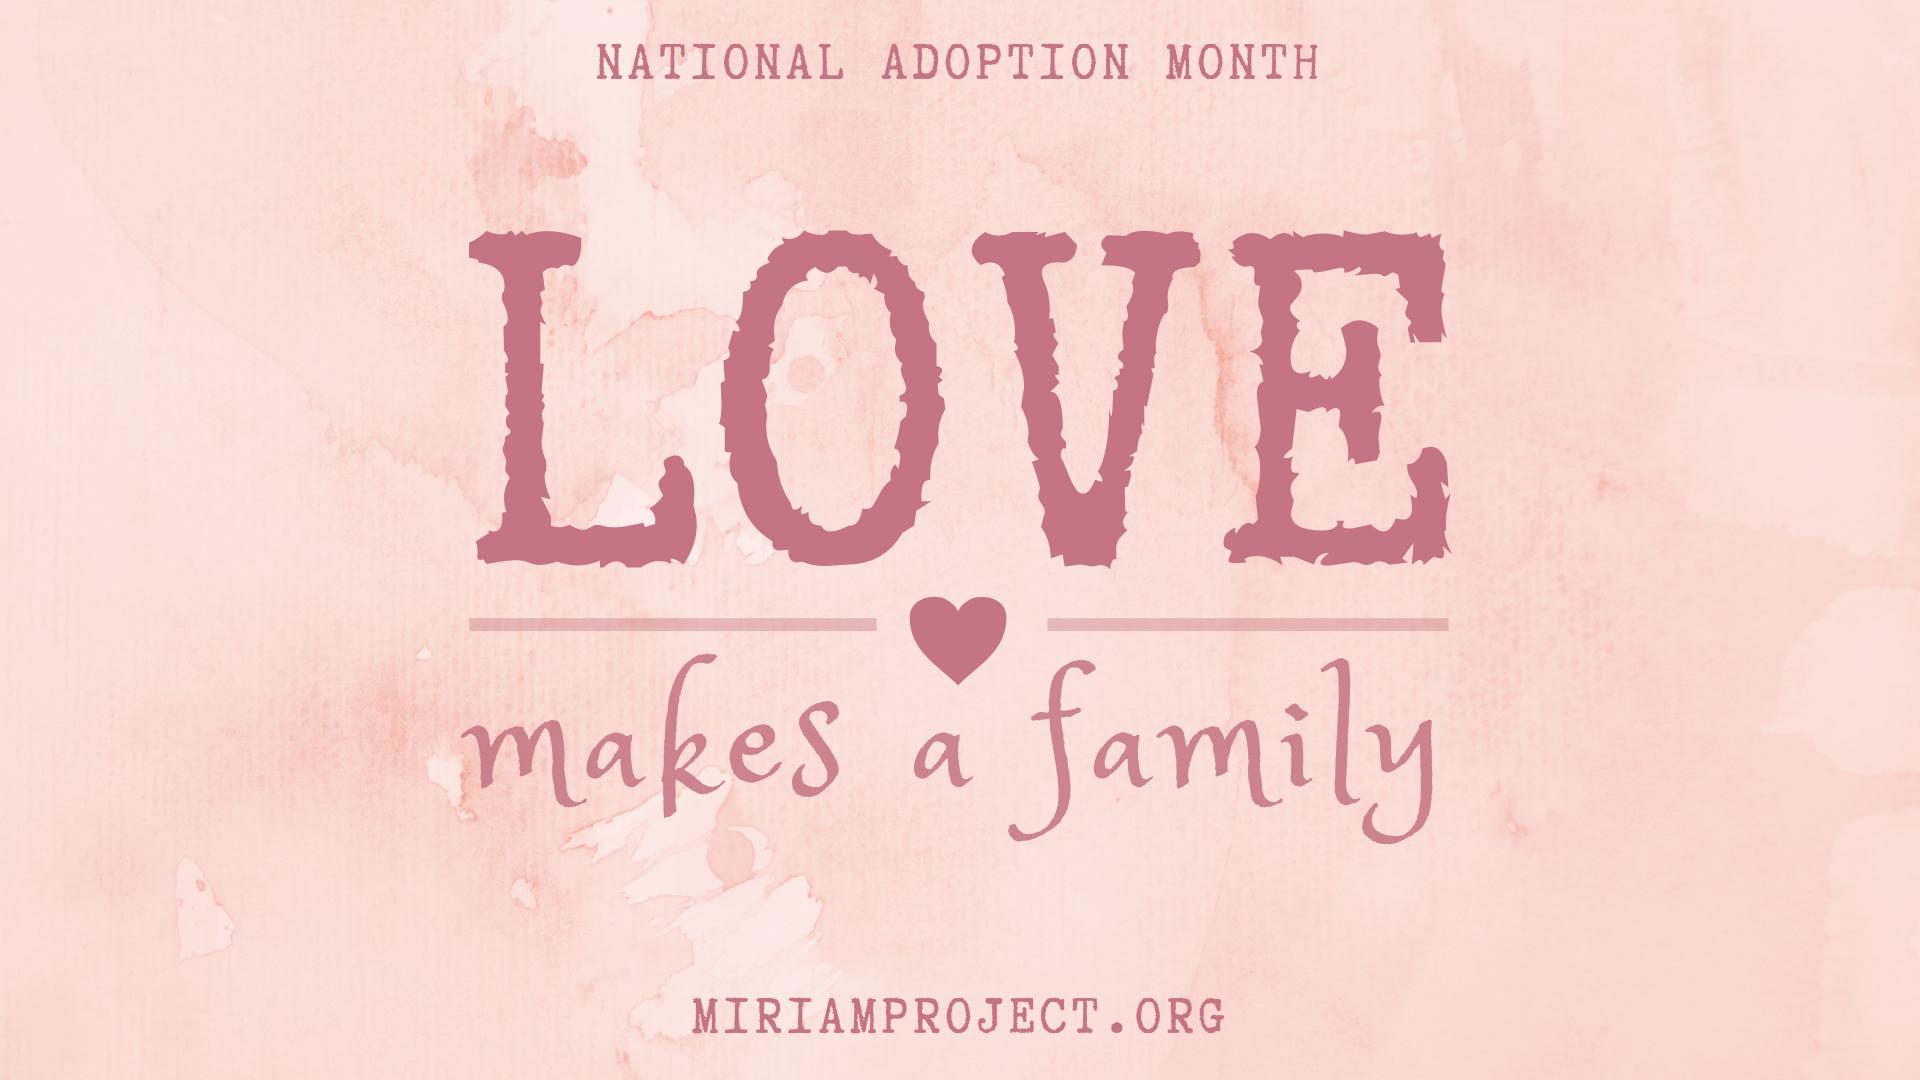 Desktop Wallpaper Adoption Nationaladoptionmonth National Adoption Month Adoption Adoption Agencies